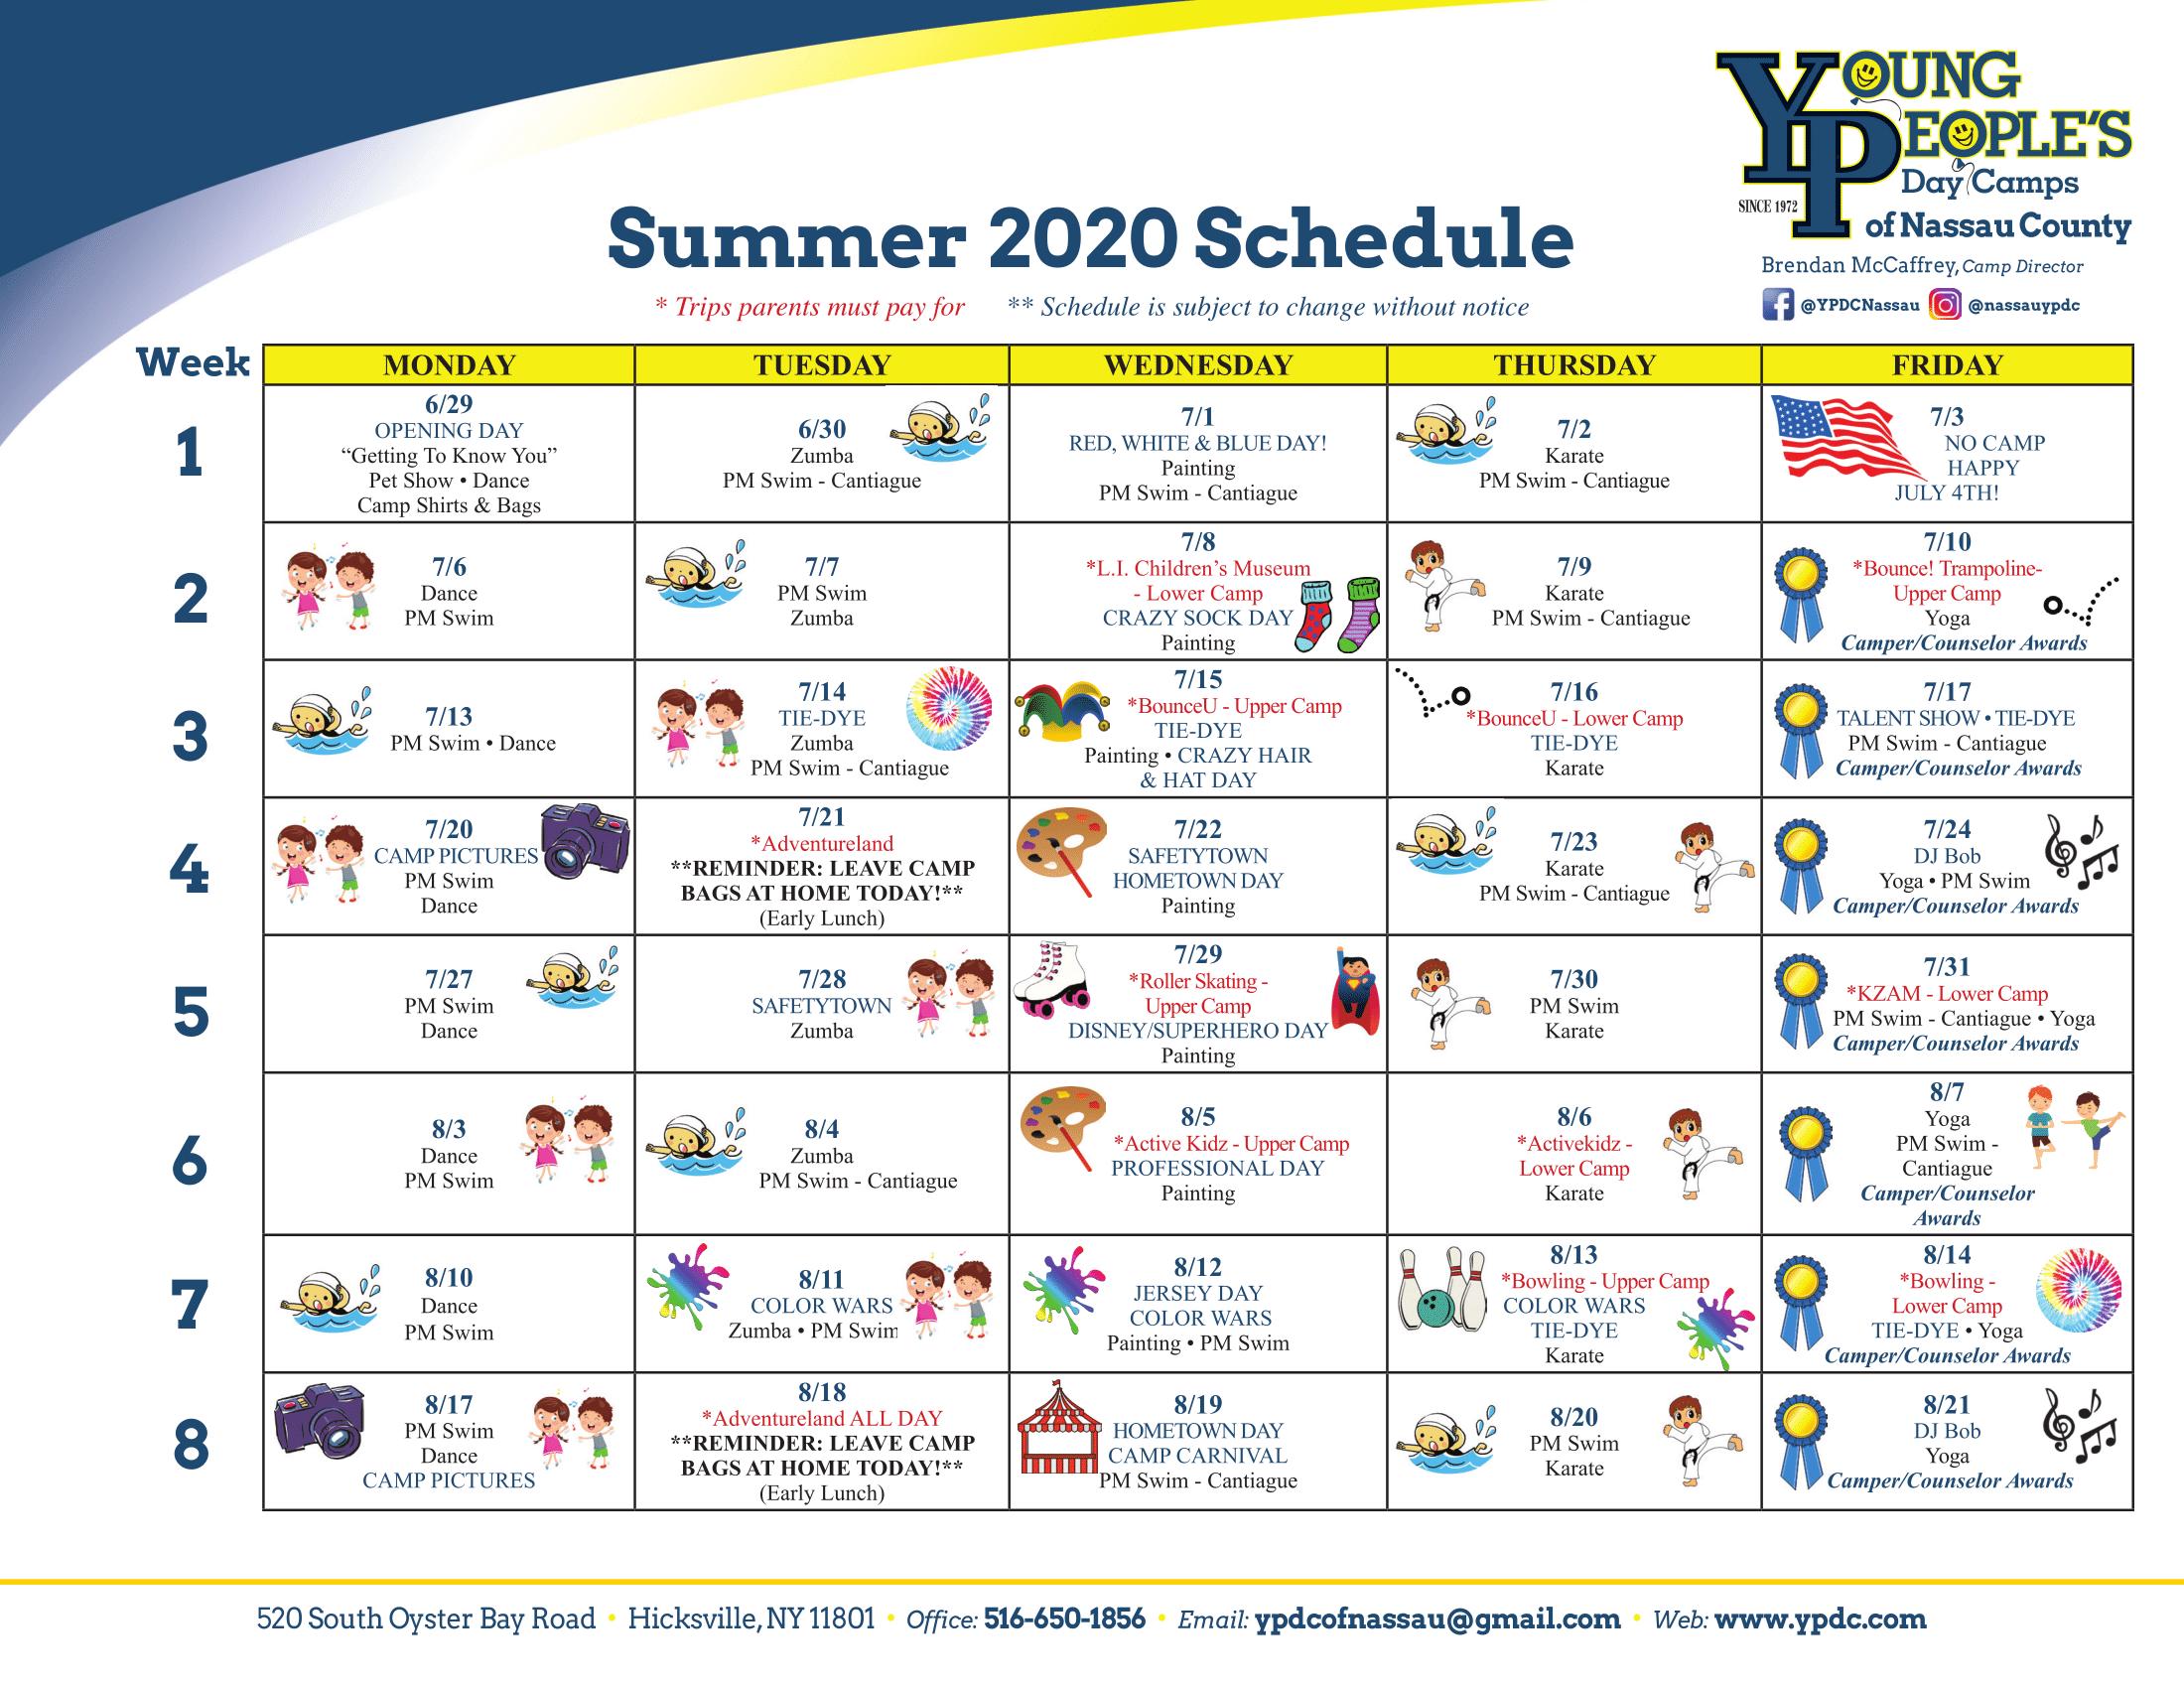 YPDC-0282 2020 Nassau Calendar-1